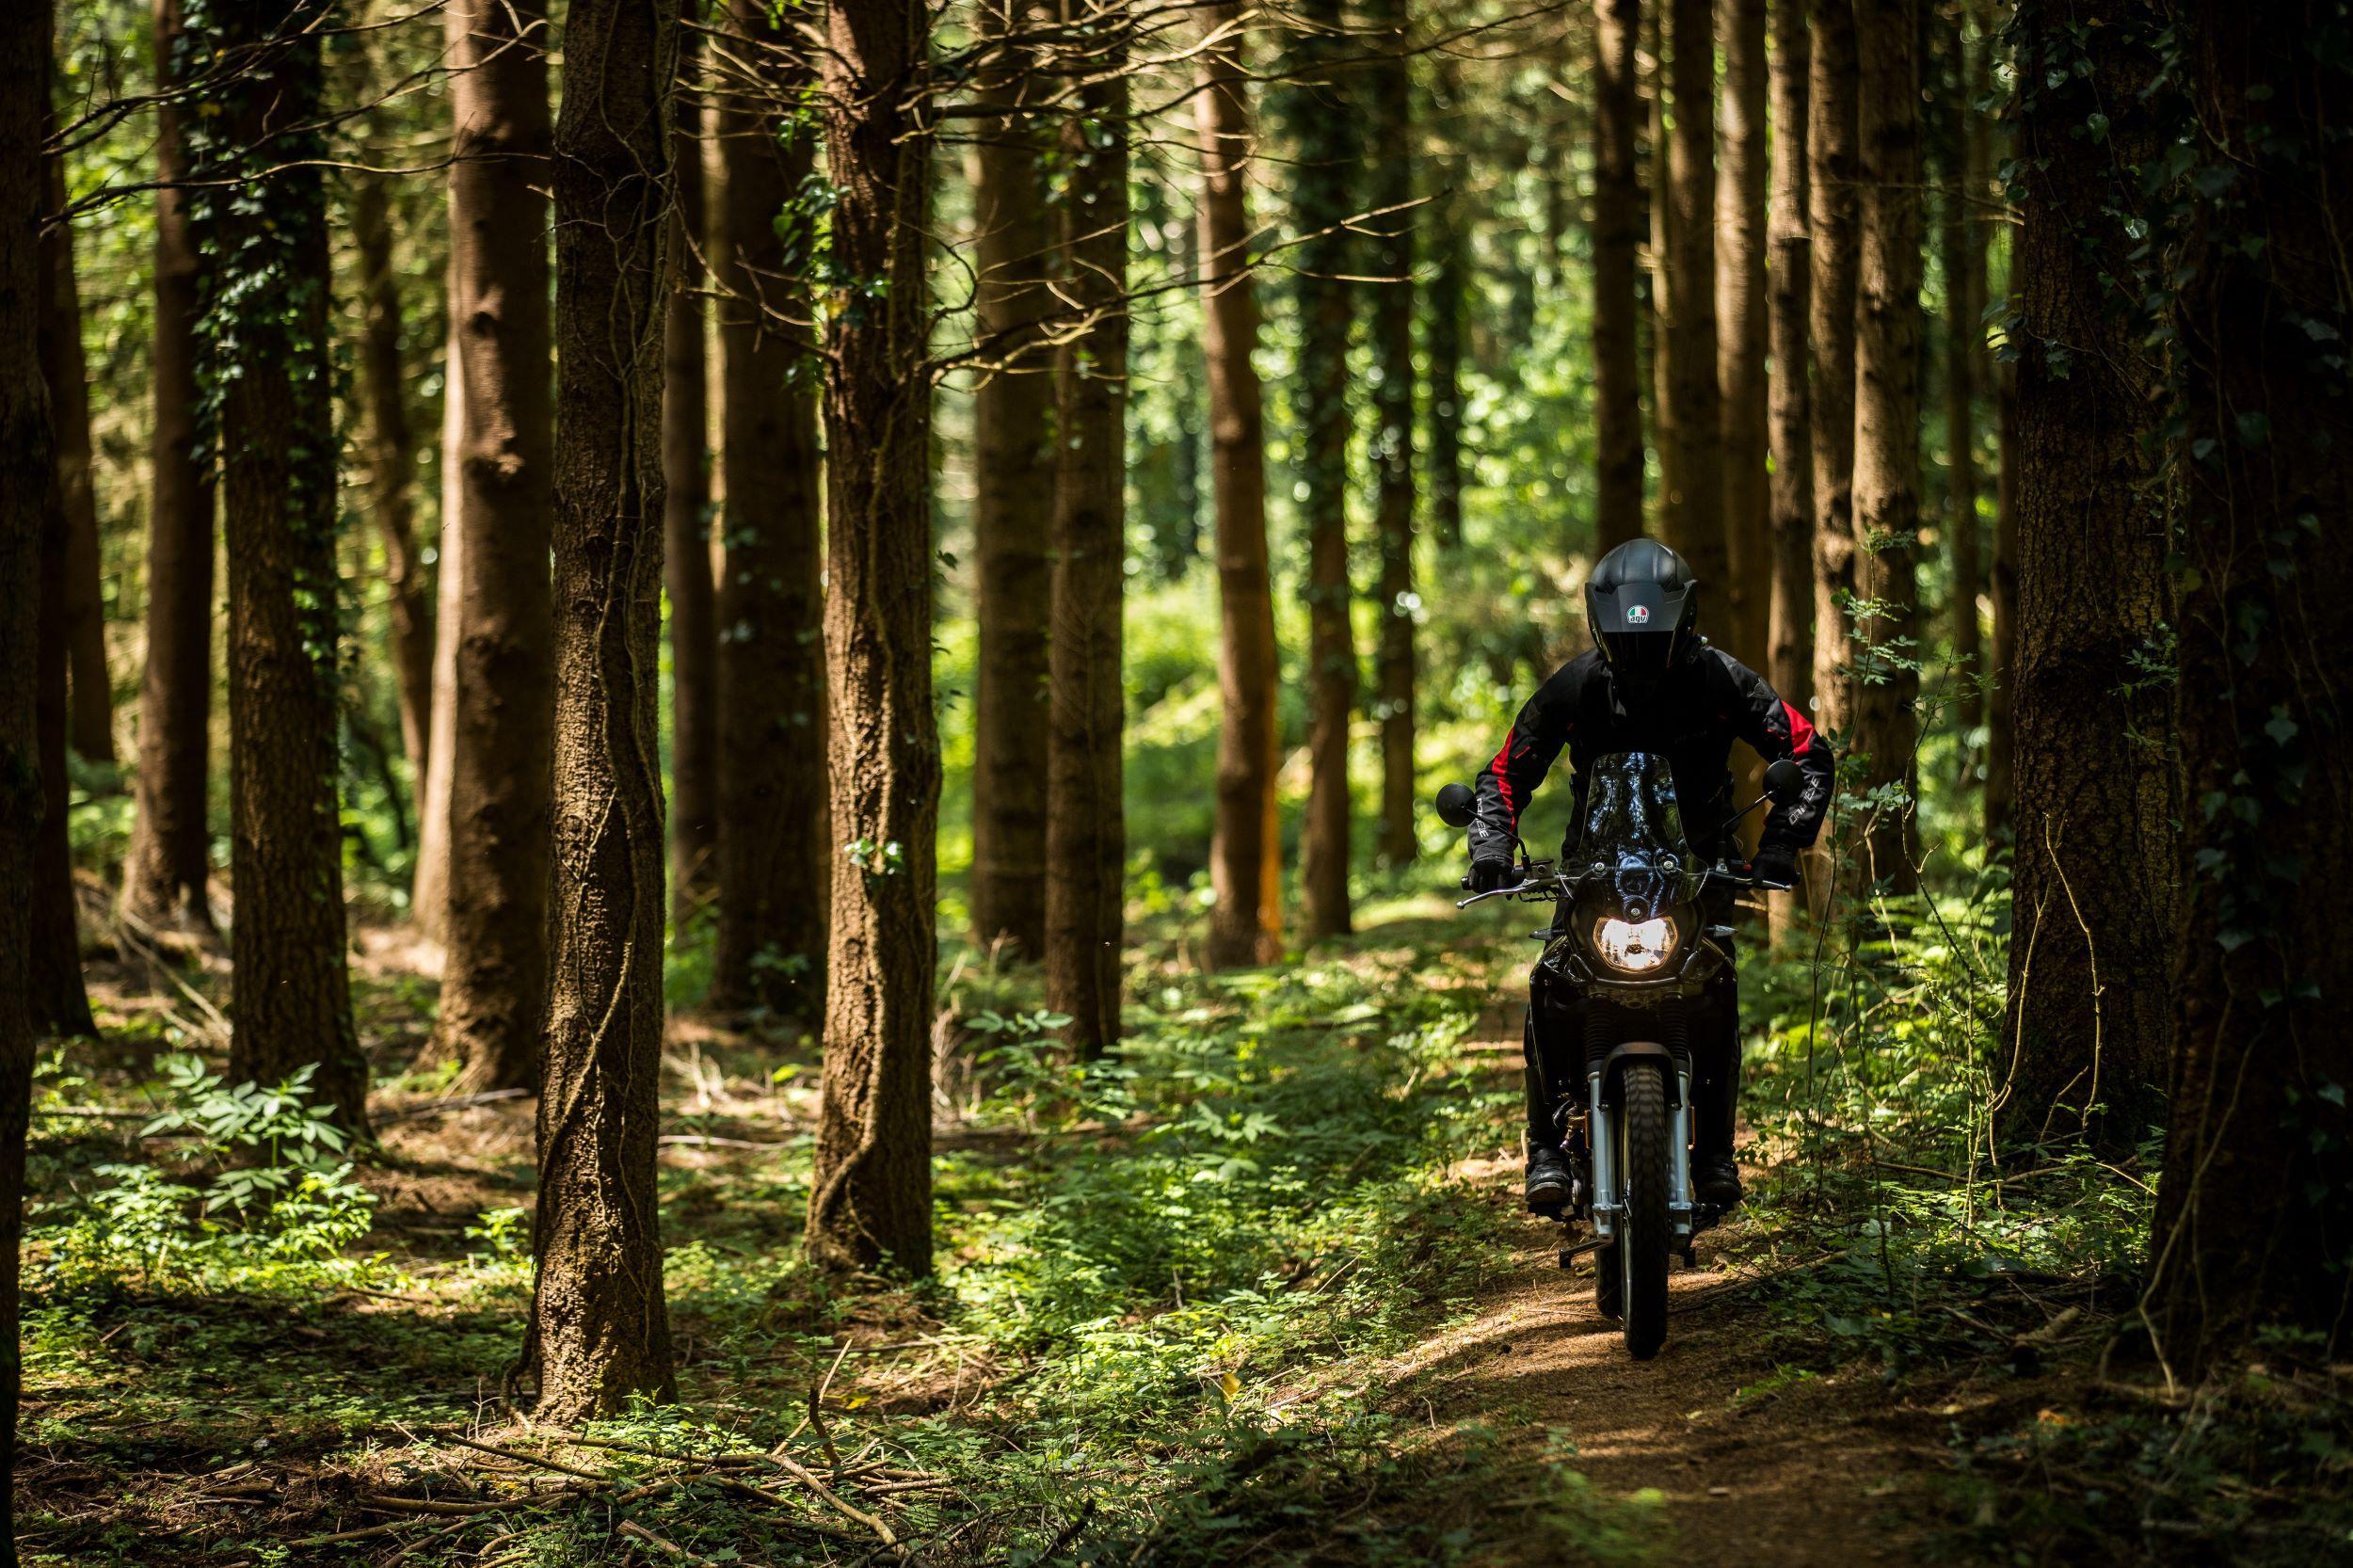 https://malaguti.bike/wp-content/uploads/sites/3/2021/08/headler-dune-x.jpg